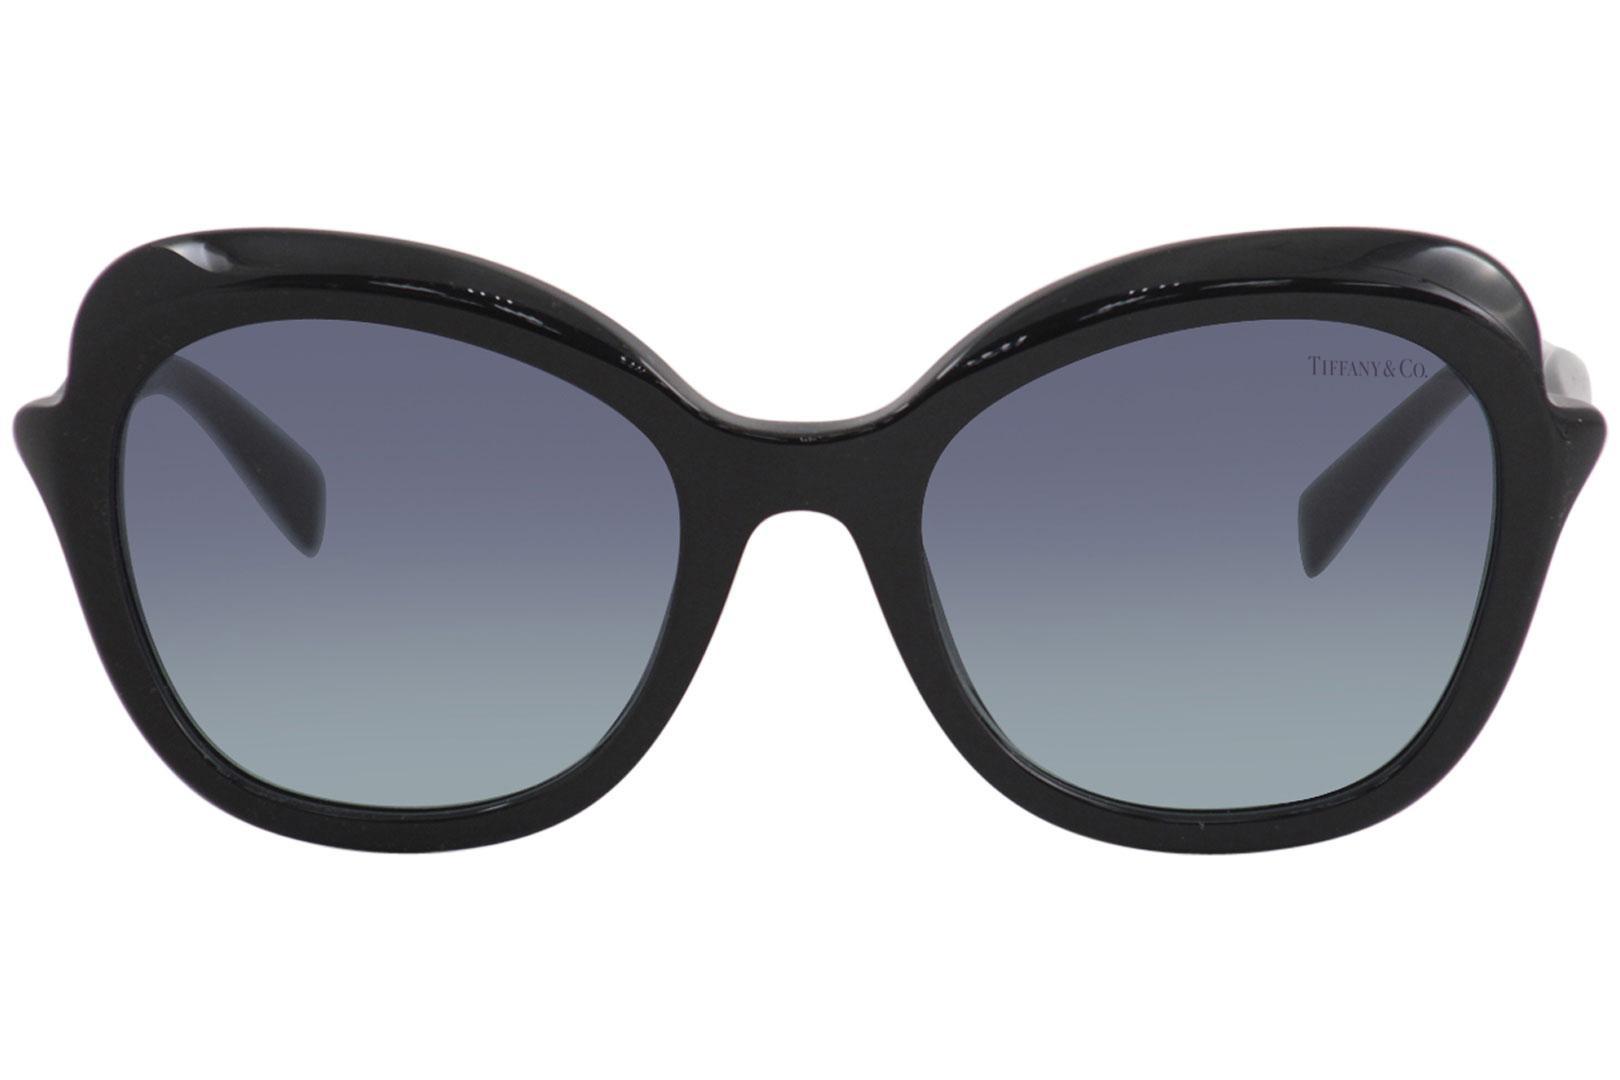 e85d13e054491 Women s TF4154 TF 4154 Fashion Cat Eye Sunglasses by Tiffany   Co.